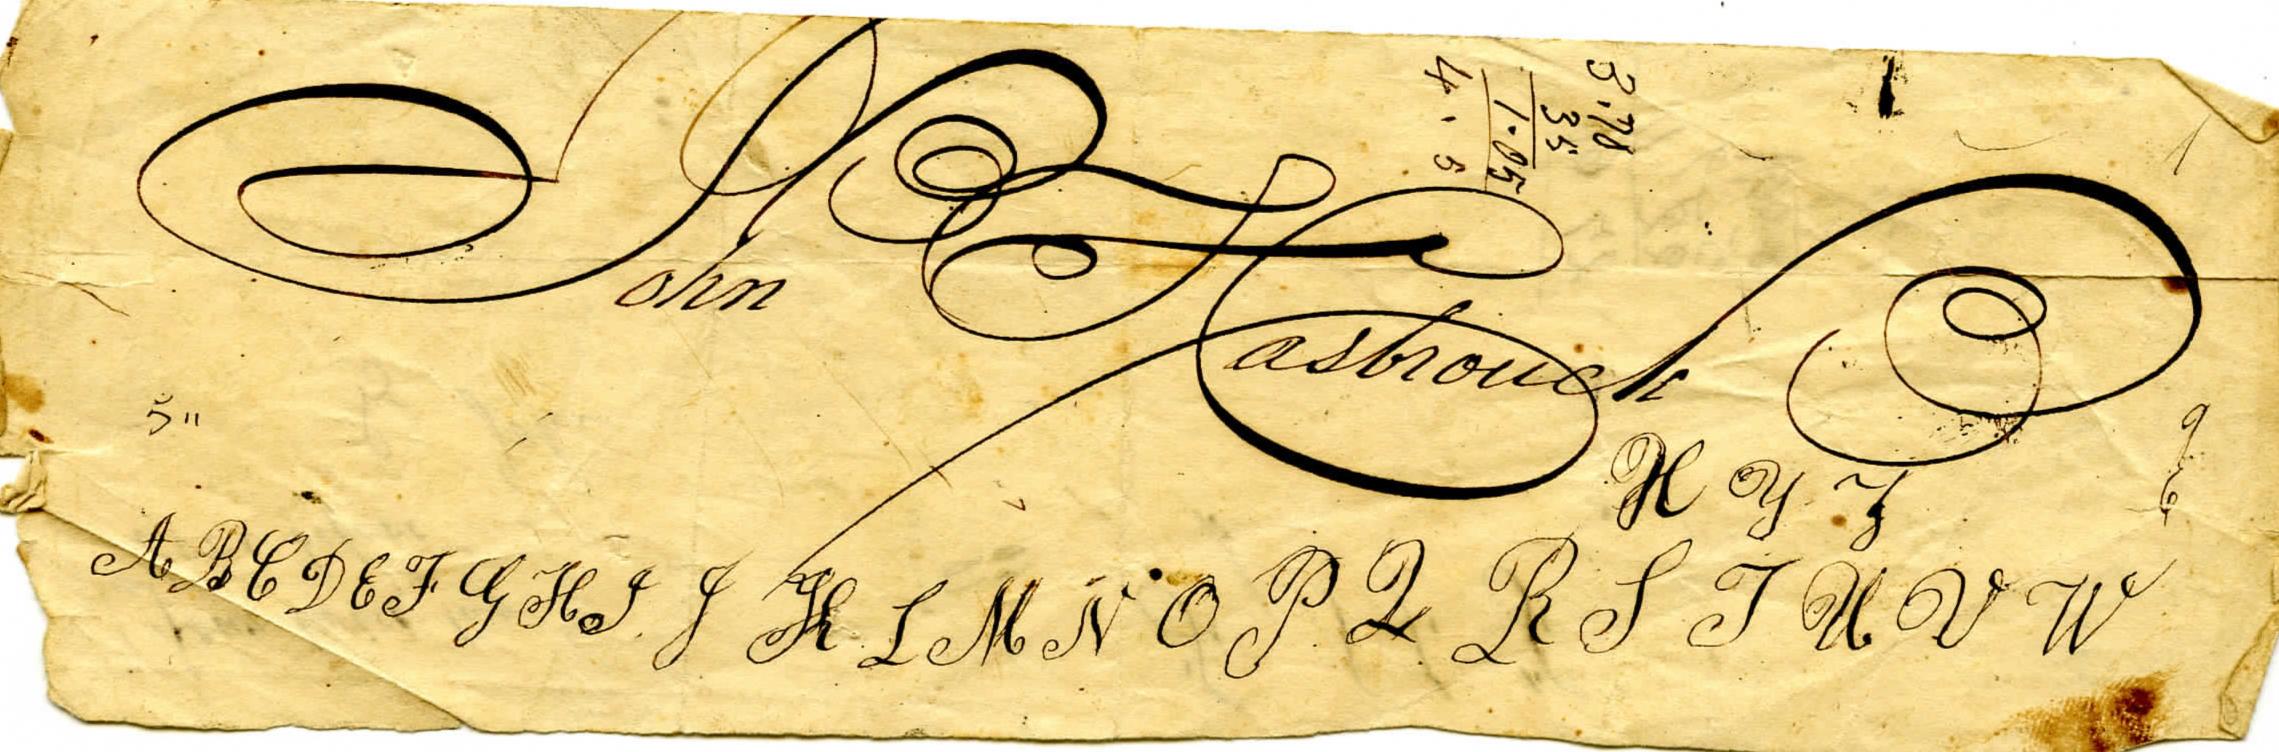 John Hasbrouck signature, Courtesy of the Haviland-Heidgerd Historical Collection.jpg